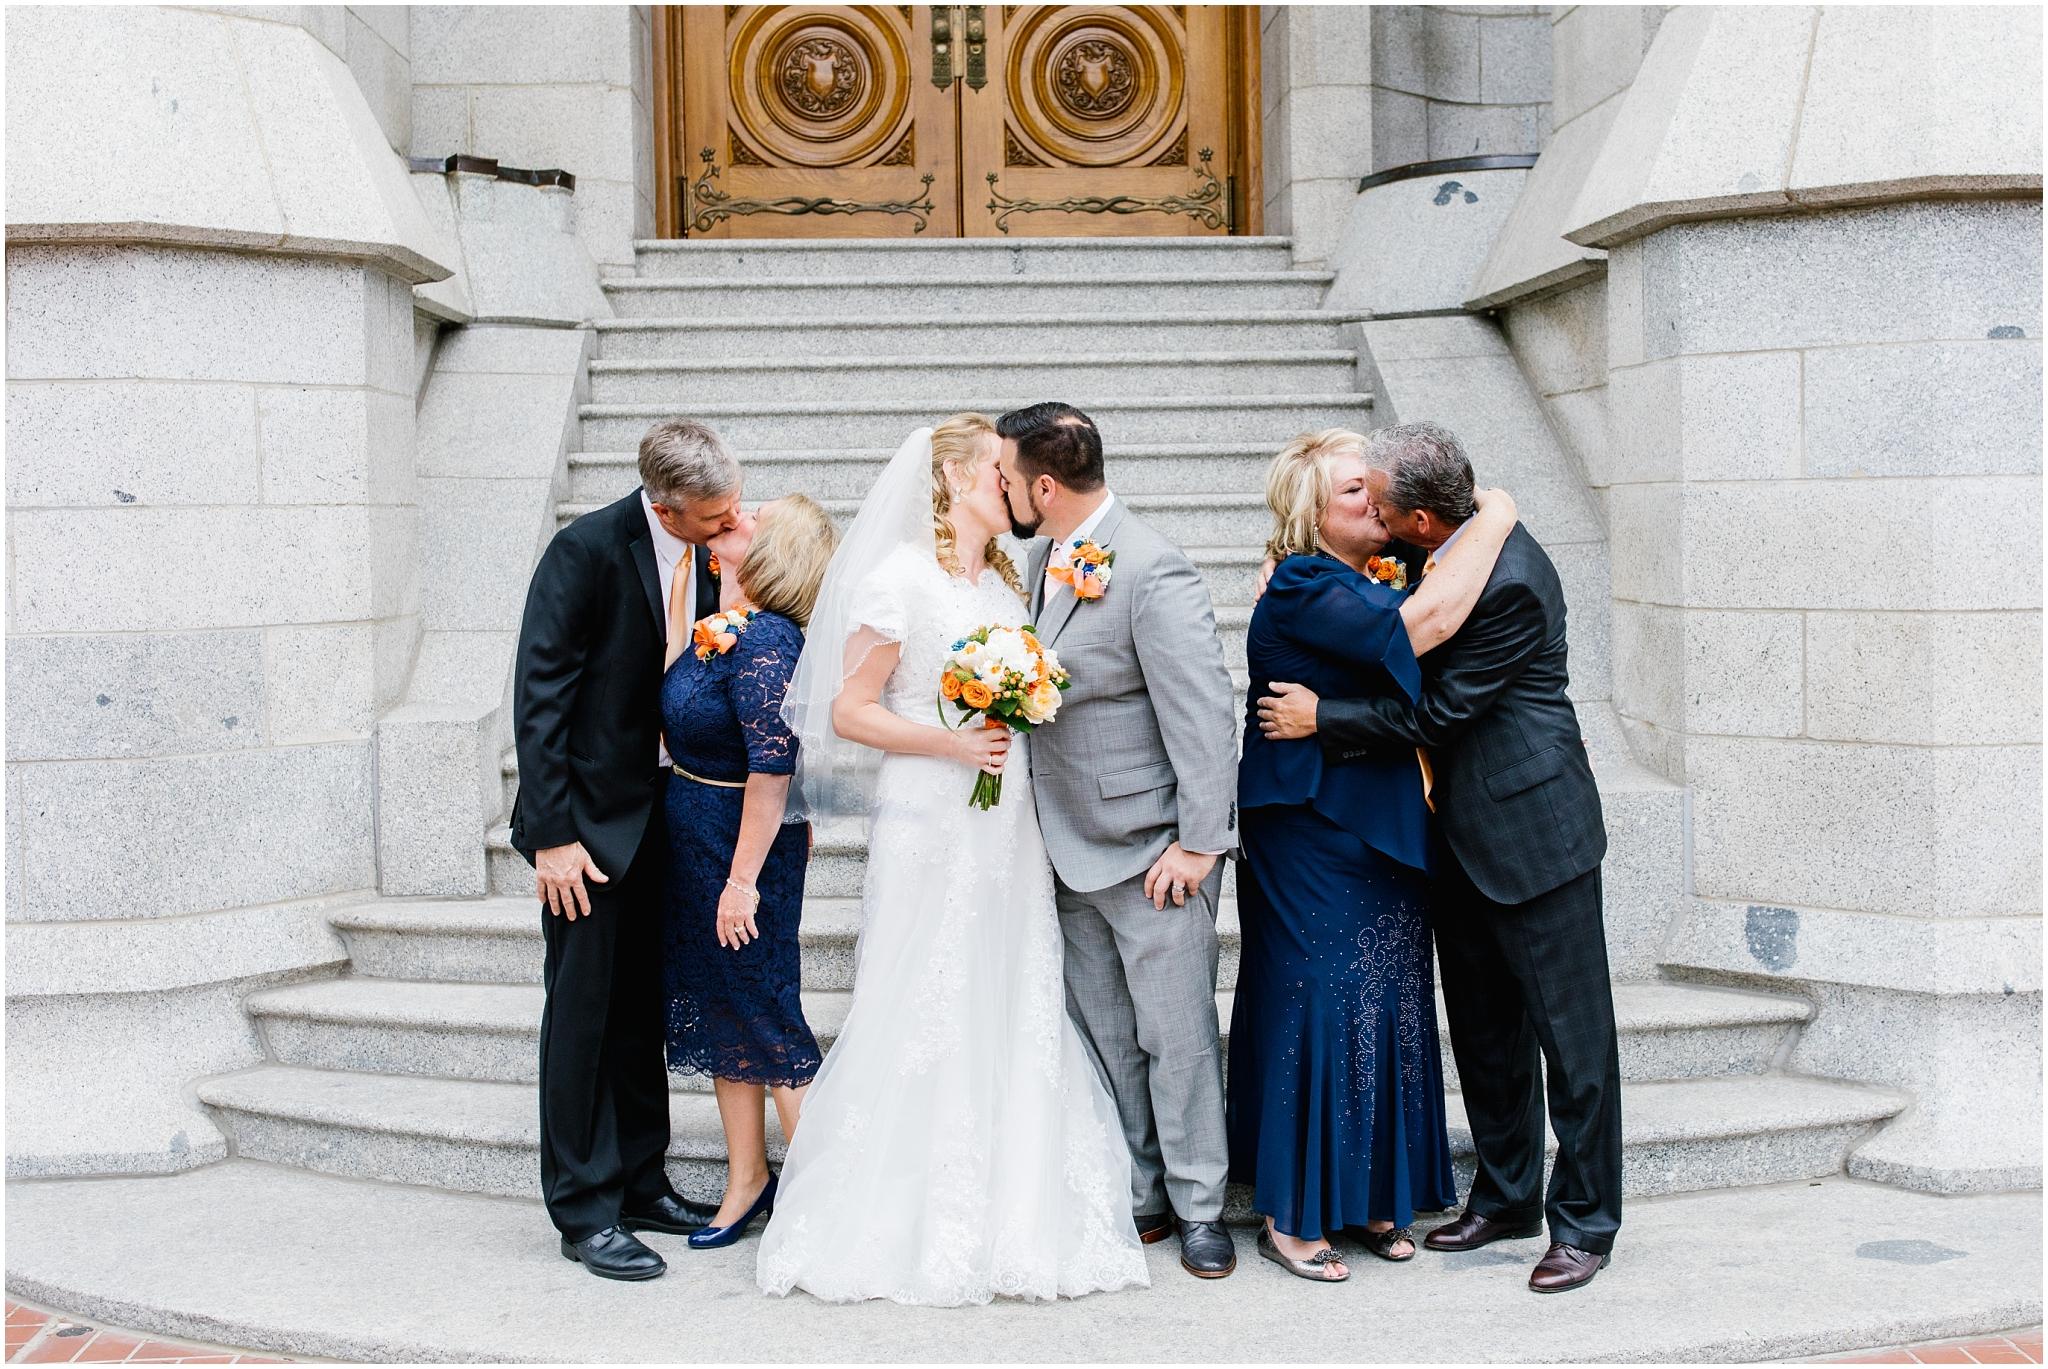 Justin and Melissa-55_Lizzie-B-Imagery-Utah-Wedding-Photographer-Salt-Lake-City-Temple-The-Grand-Ballroom.jpg